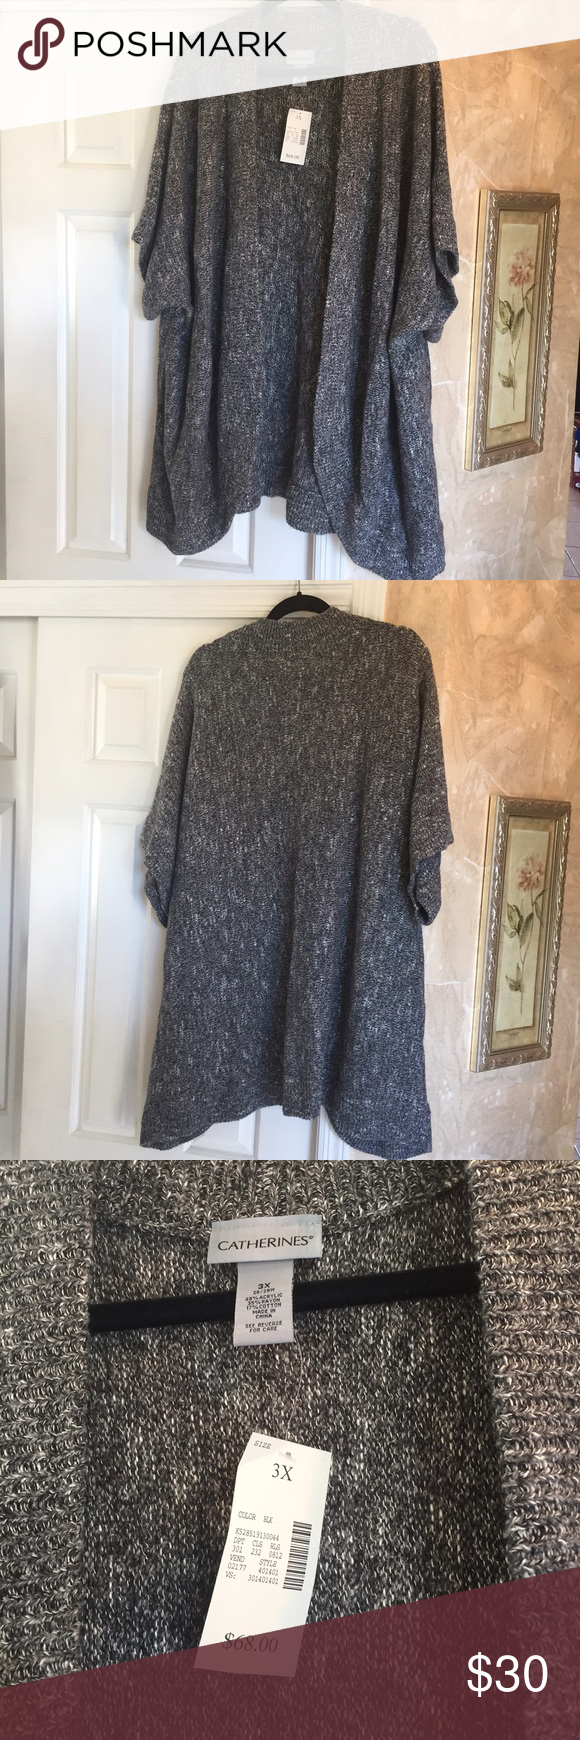 Catherines short sleeve cardigan   Short sleeves, Shorts and Cotton